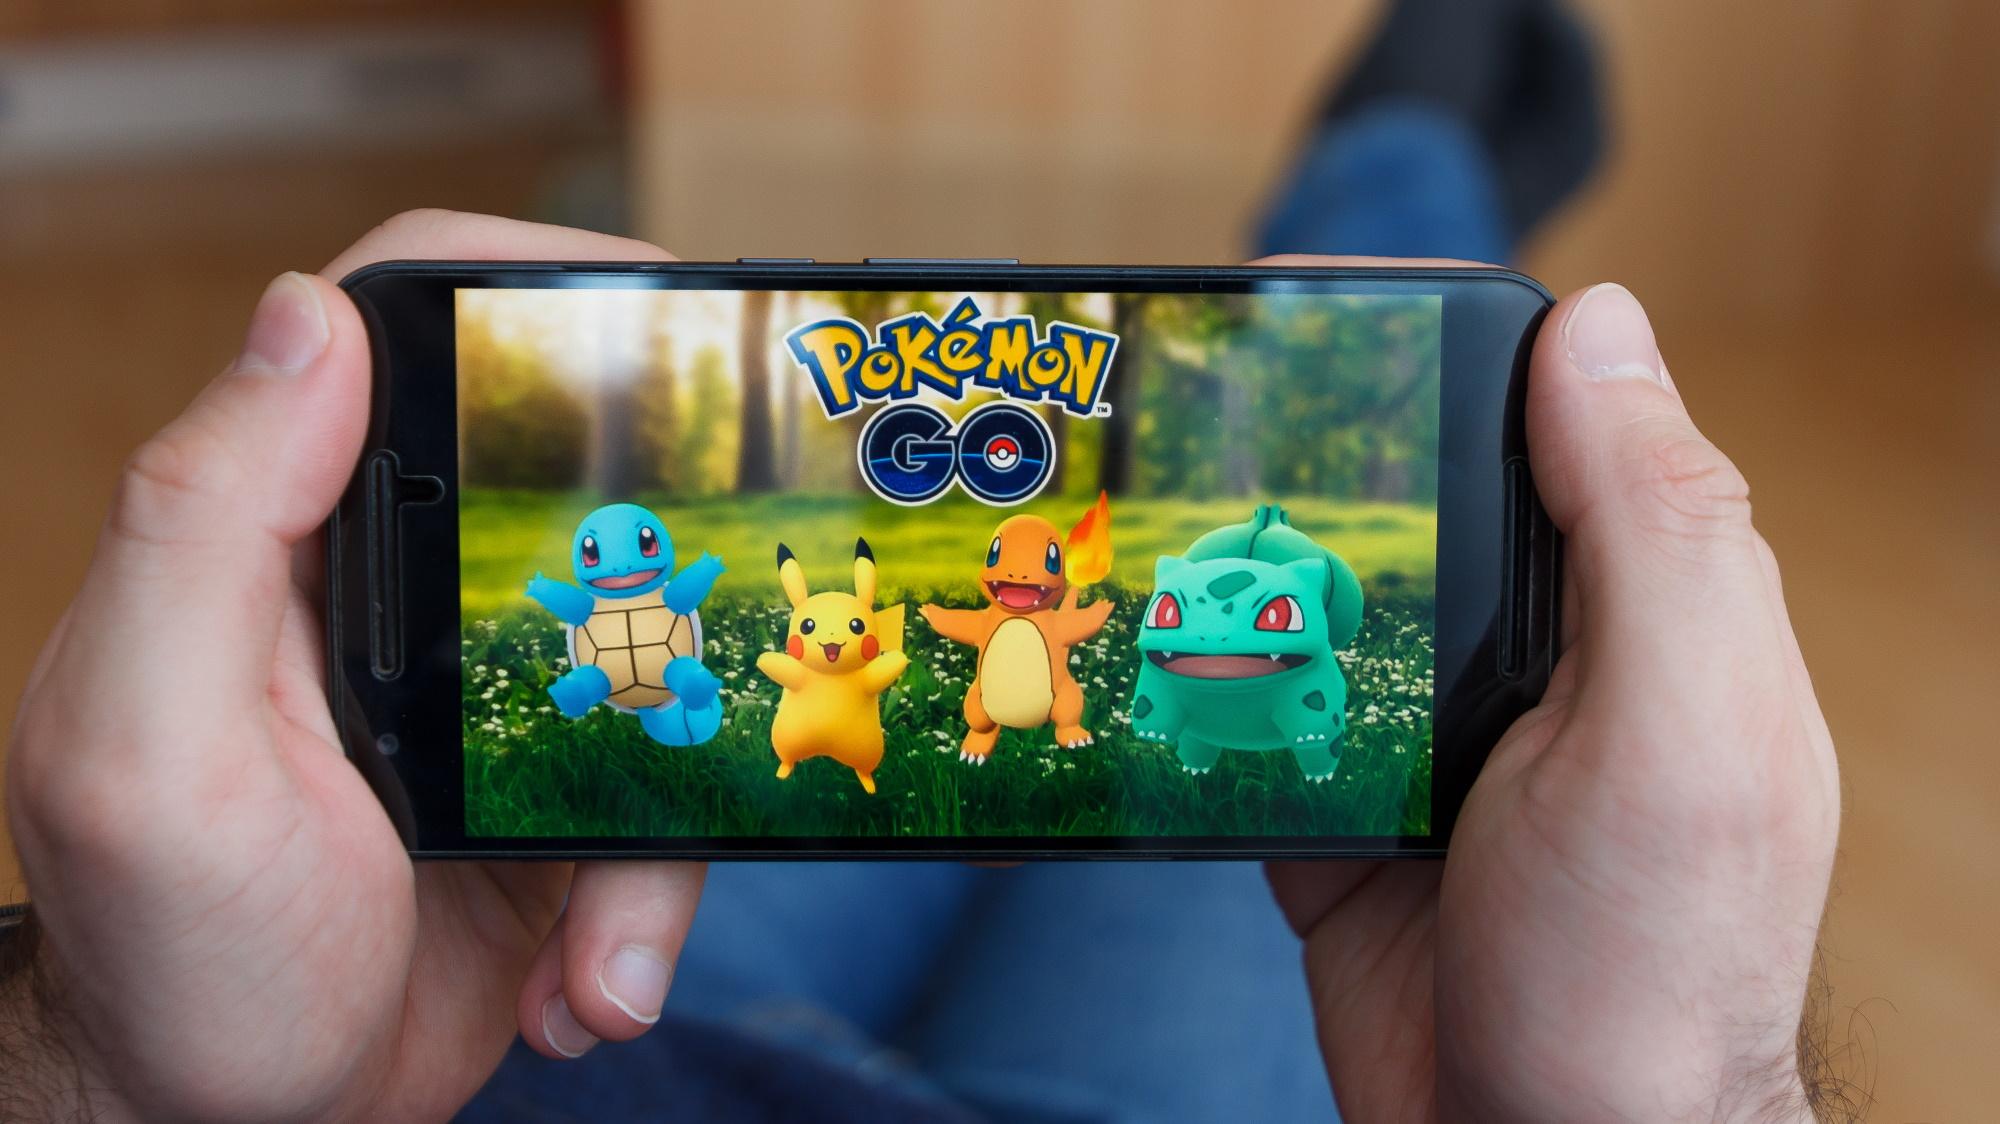 Gps pc faker go pokemon [Pokemon GO